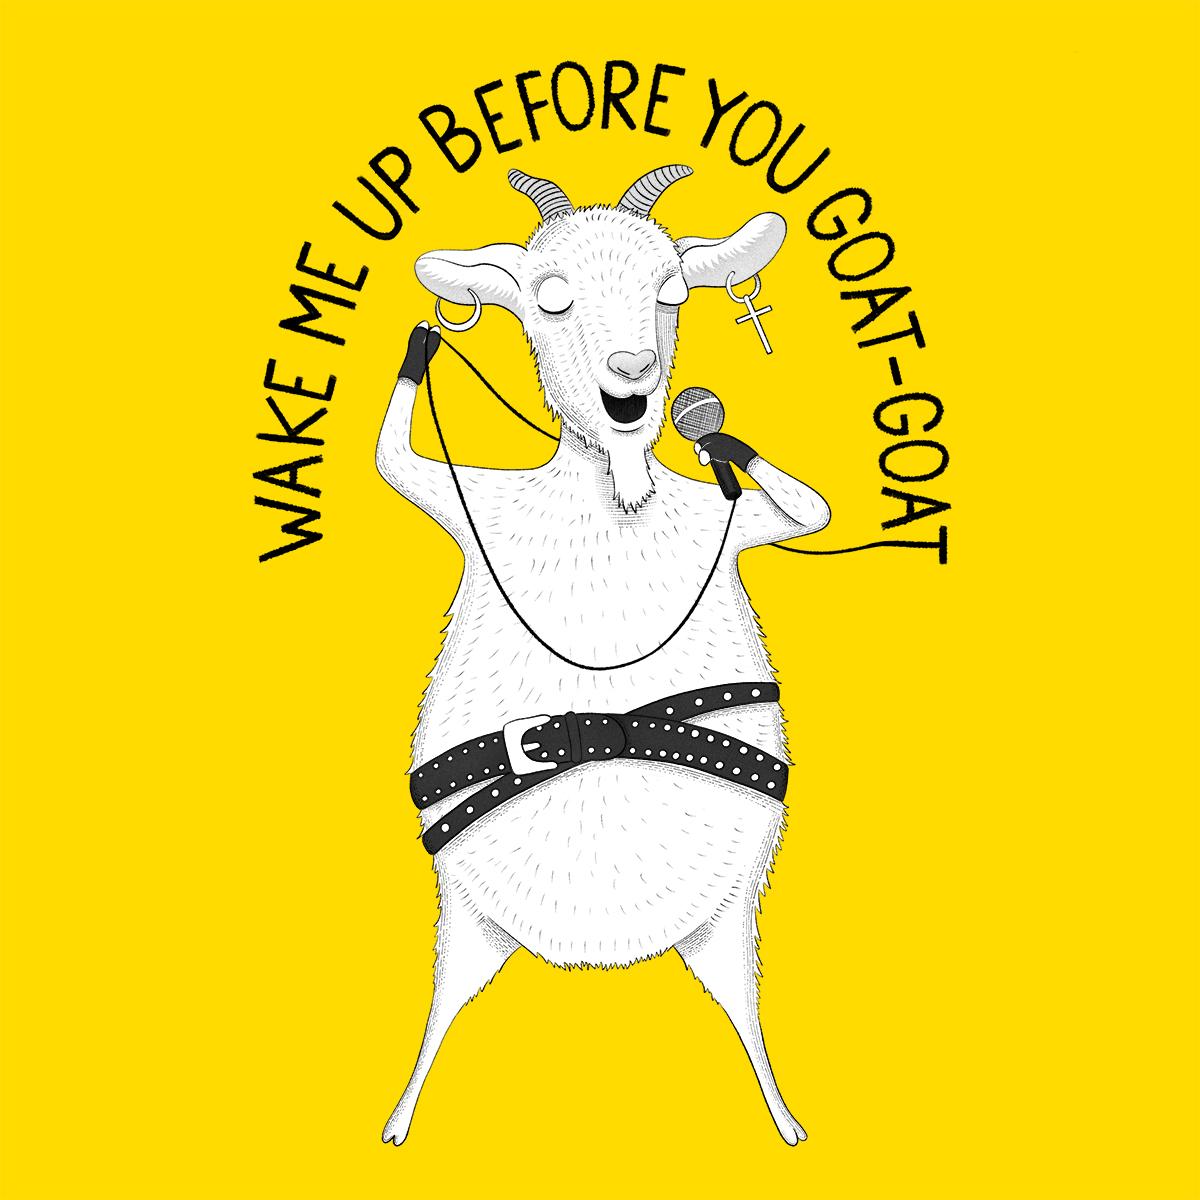 Goat singing George Michael Animal Karaoke illustration by drawingeggen